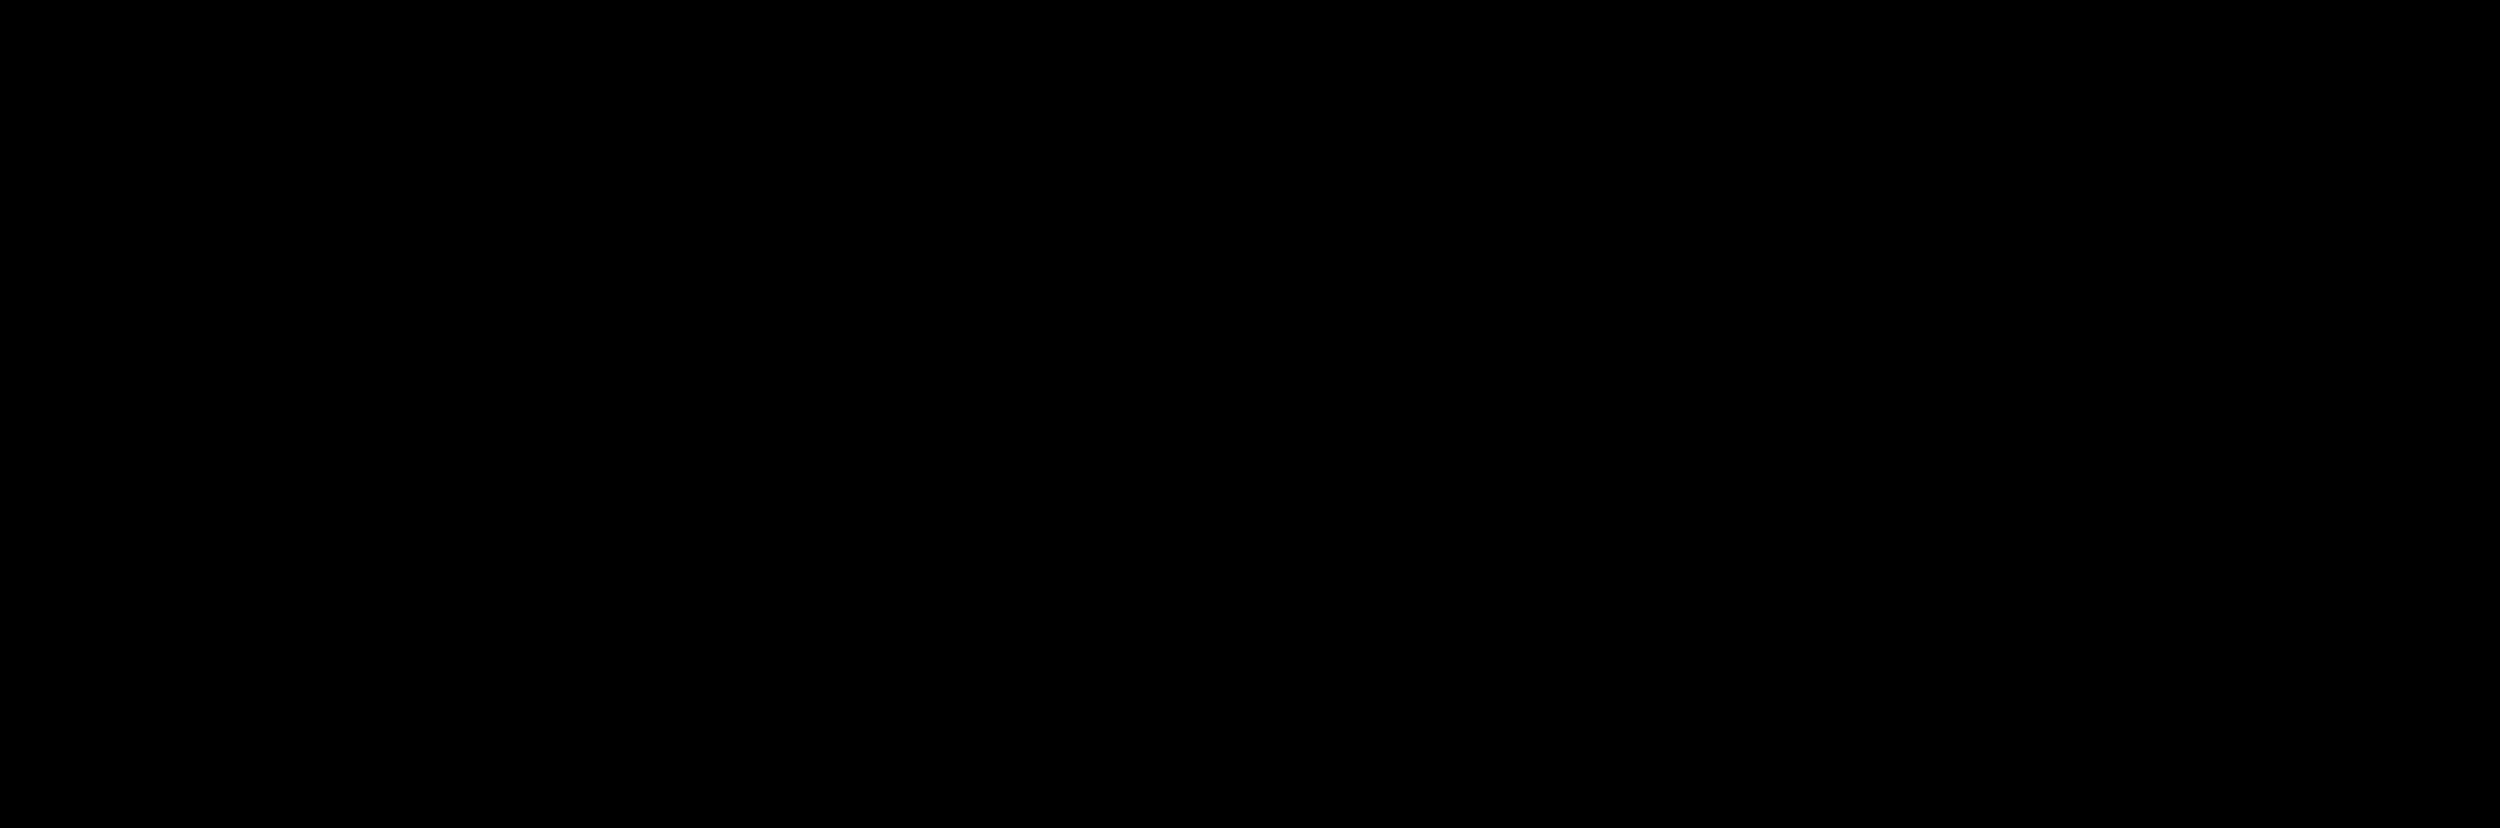 Signature-04.png